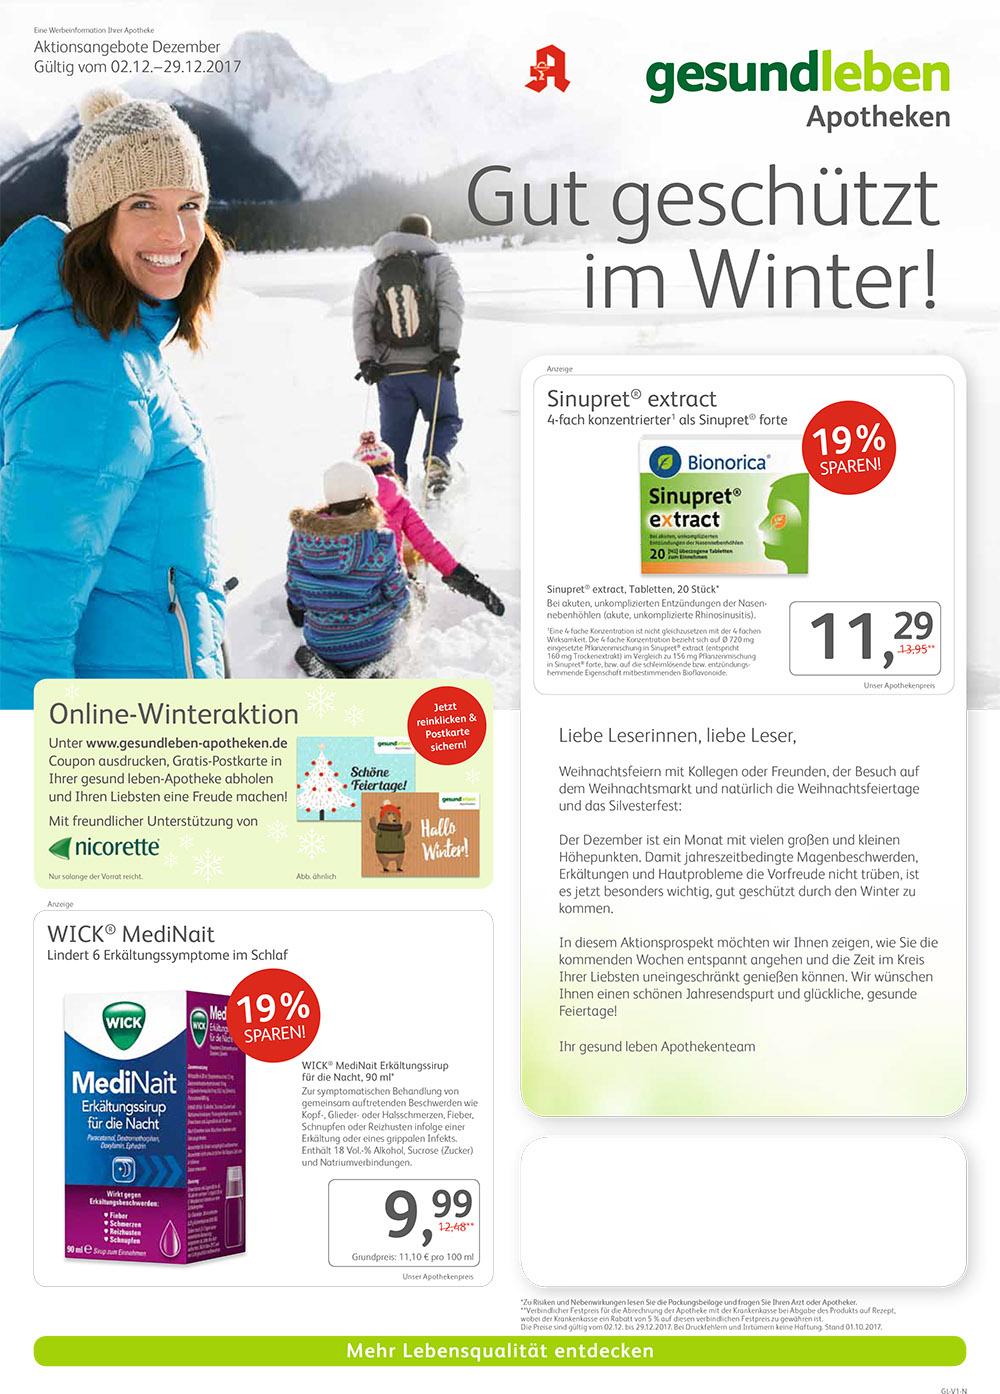 http://www.apotheken.de/fileadmin/clubarea/00000-Angebote/67459_5899_rehbach_angebot_1.jpg